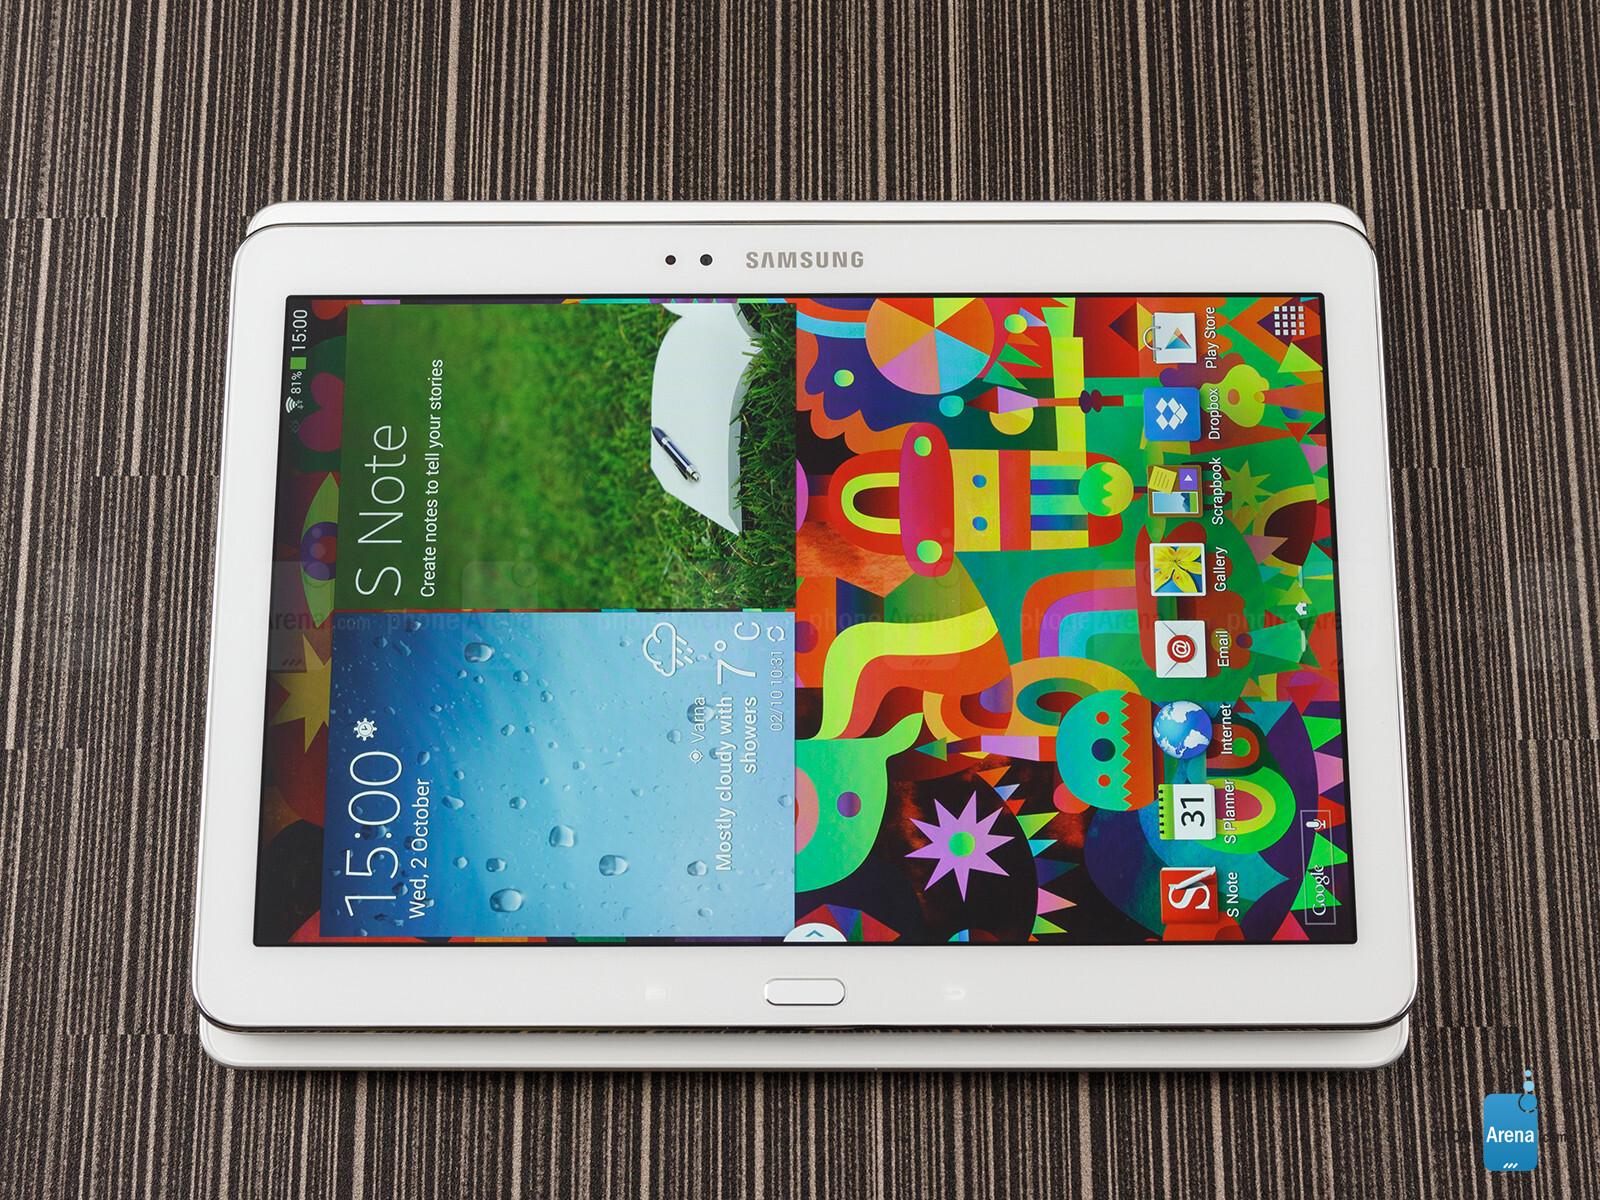 samsung galaxy note 10 1 2014 vs apple ipad 4. Black Bedroom Furniture Sets. Home Design Ideas